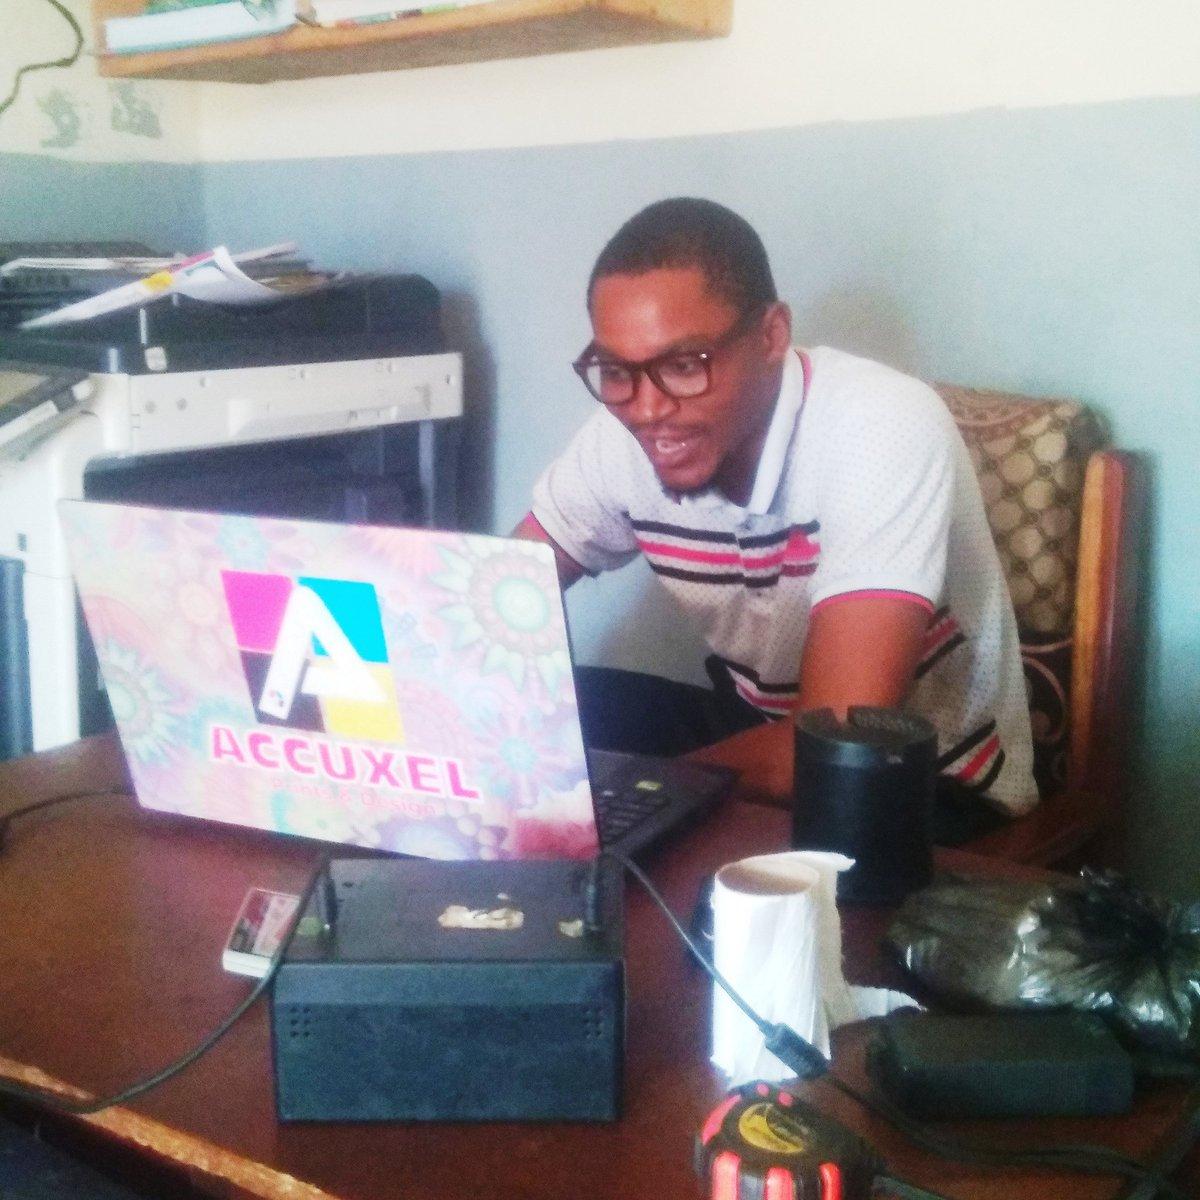 Men at work! #accuxelprints #accues #accuxel #printerinilorin #ilorin #arewailorinpple #arewailorinpple #unilorin #unilorinslayers #unilorinhotties #unilorinconnect #ilorinslayers #ilorinbusiness #kwasu #kwasuconnect #kwasuslayerspic.twitter.com/ZkBGEbOF5C